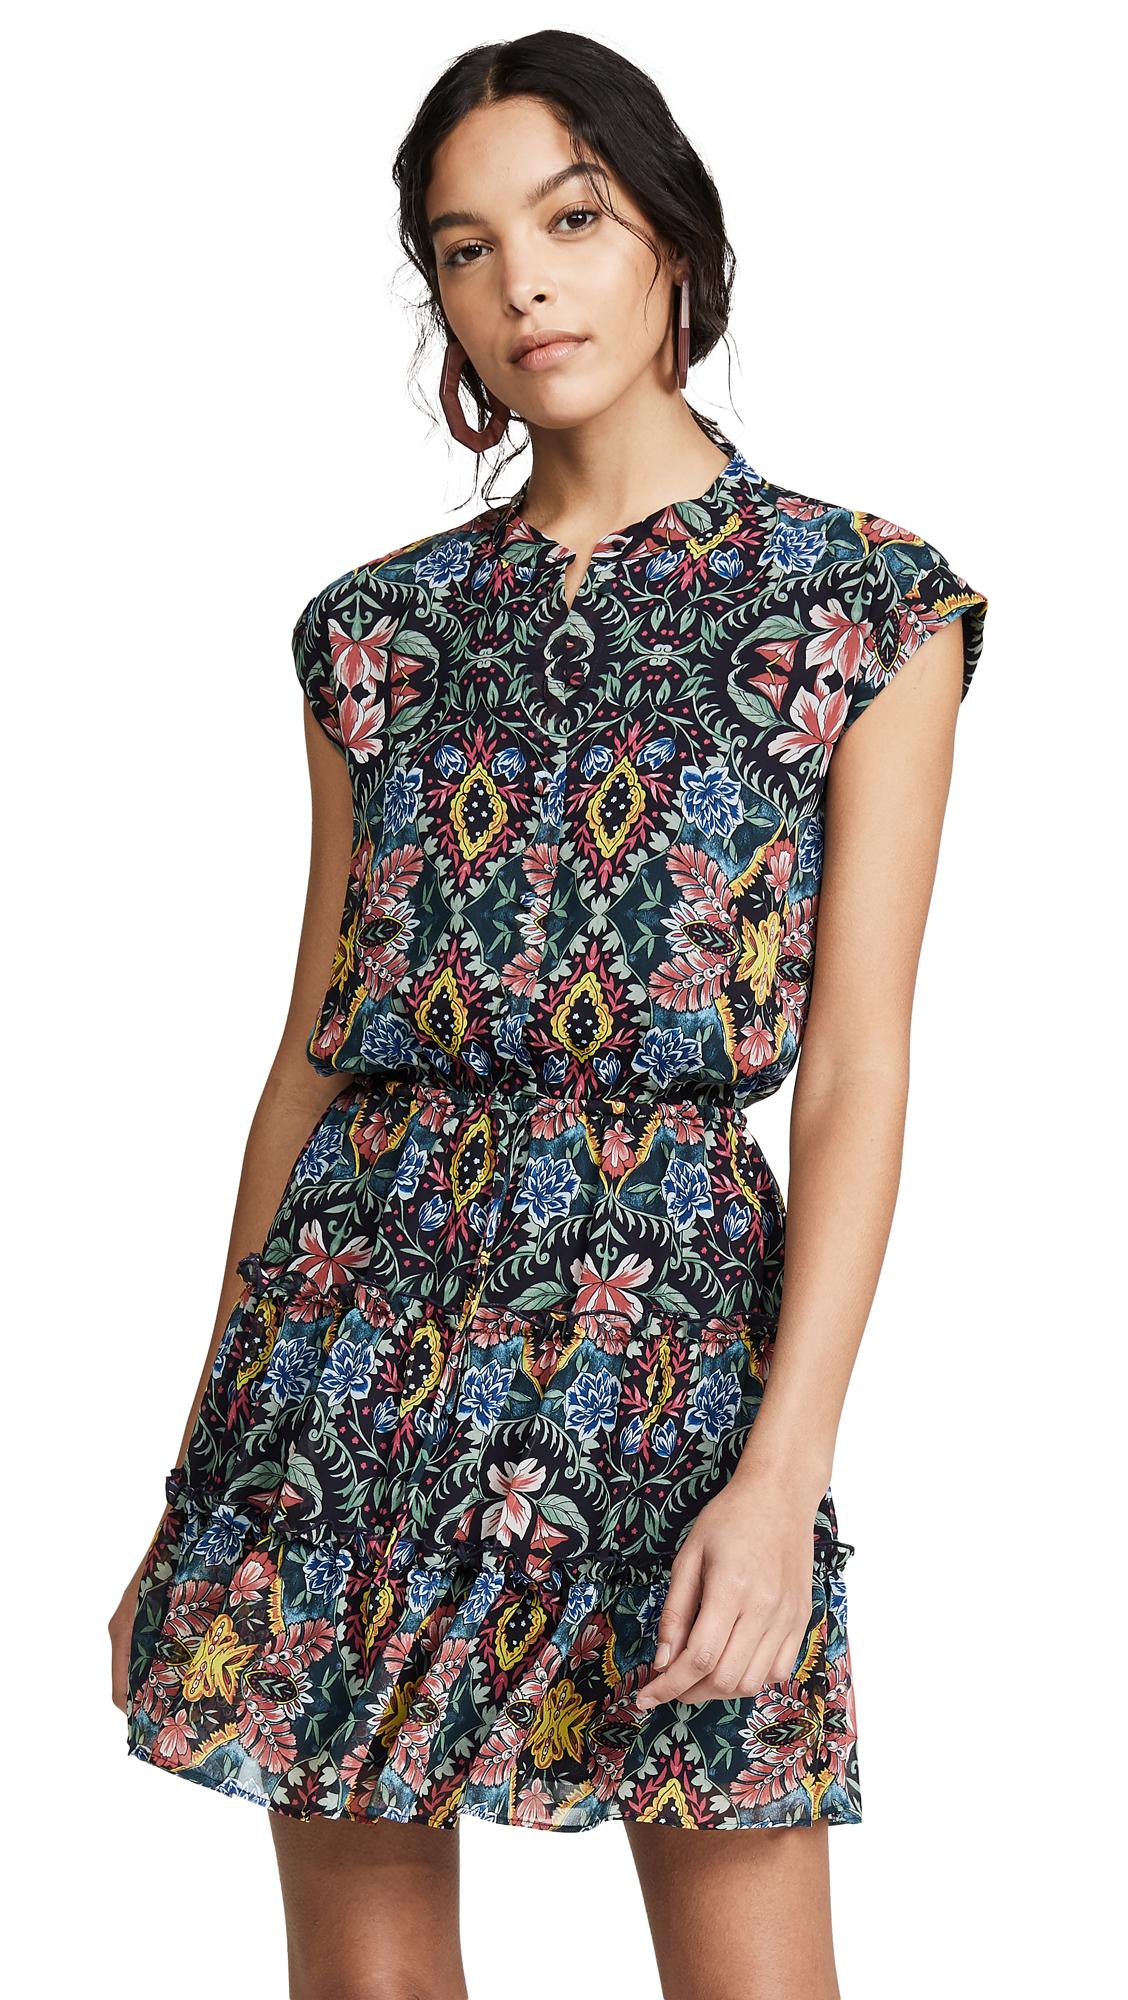 Rebecca Minkoff Ollie Dress - Multi